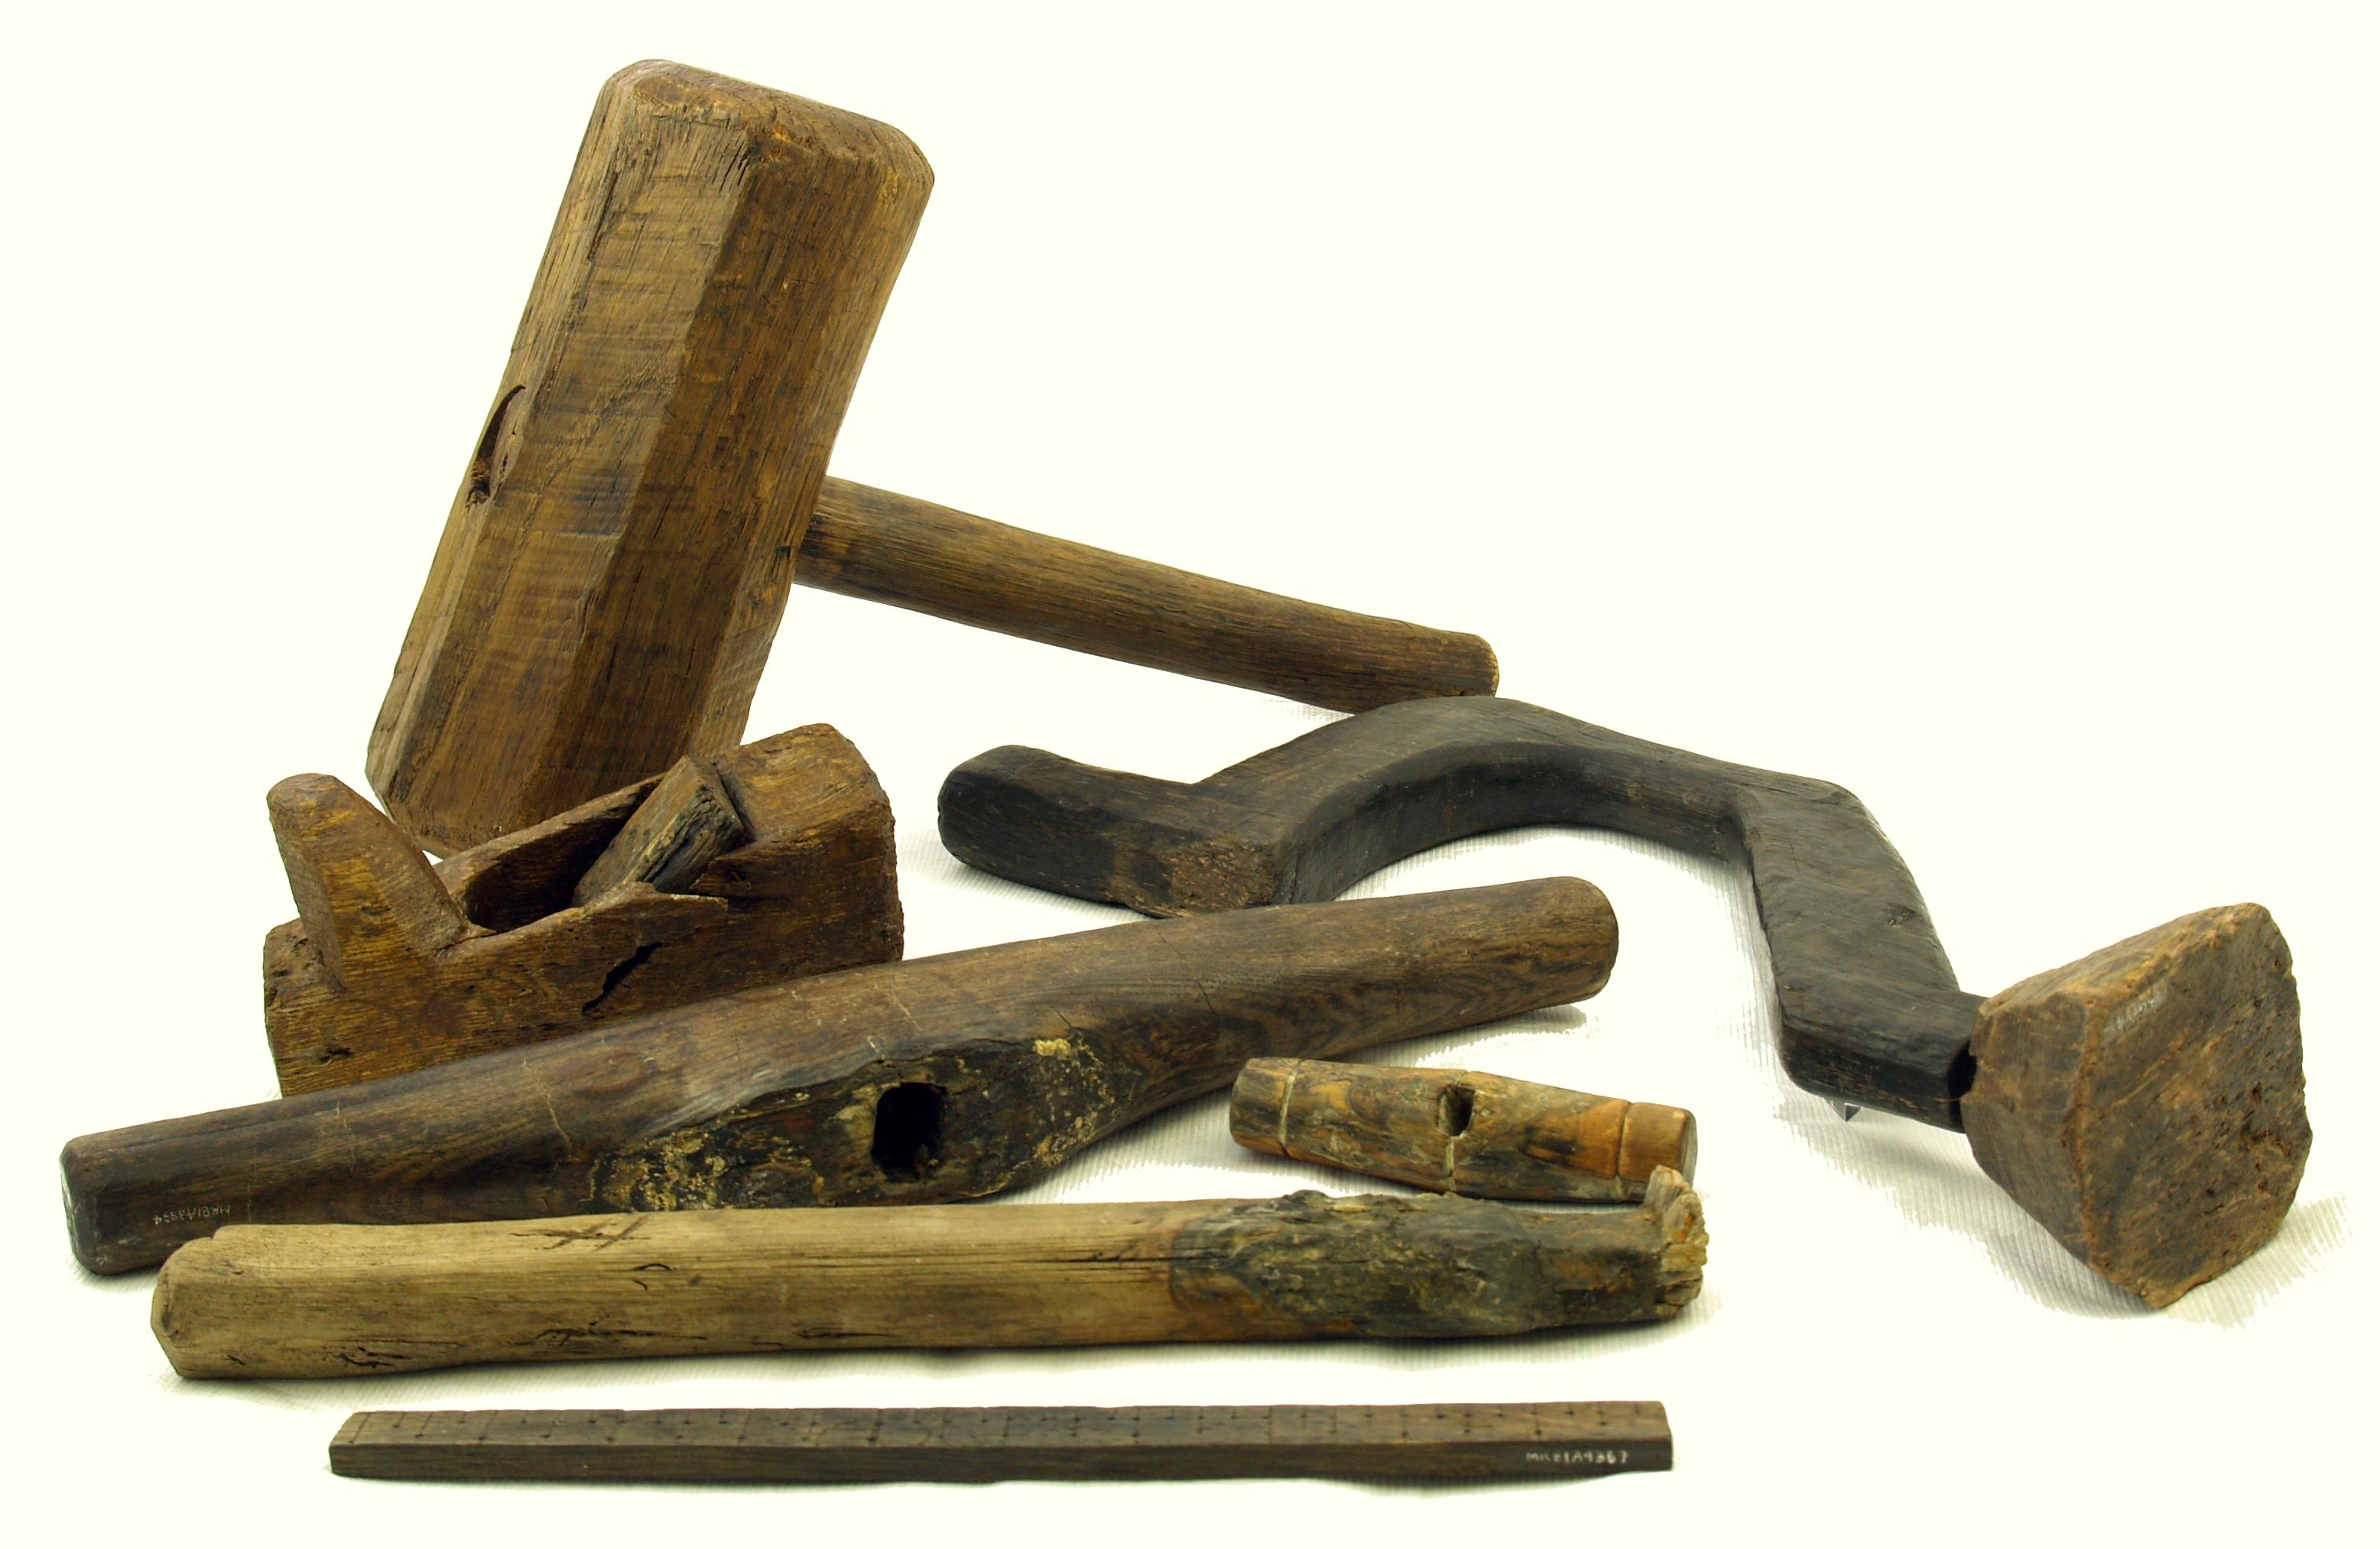 File:MaryRose-carpentry tools2.JPG - Wikimedia Commons